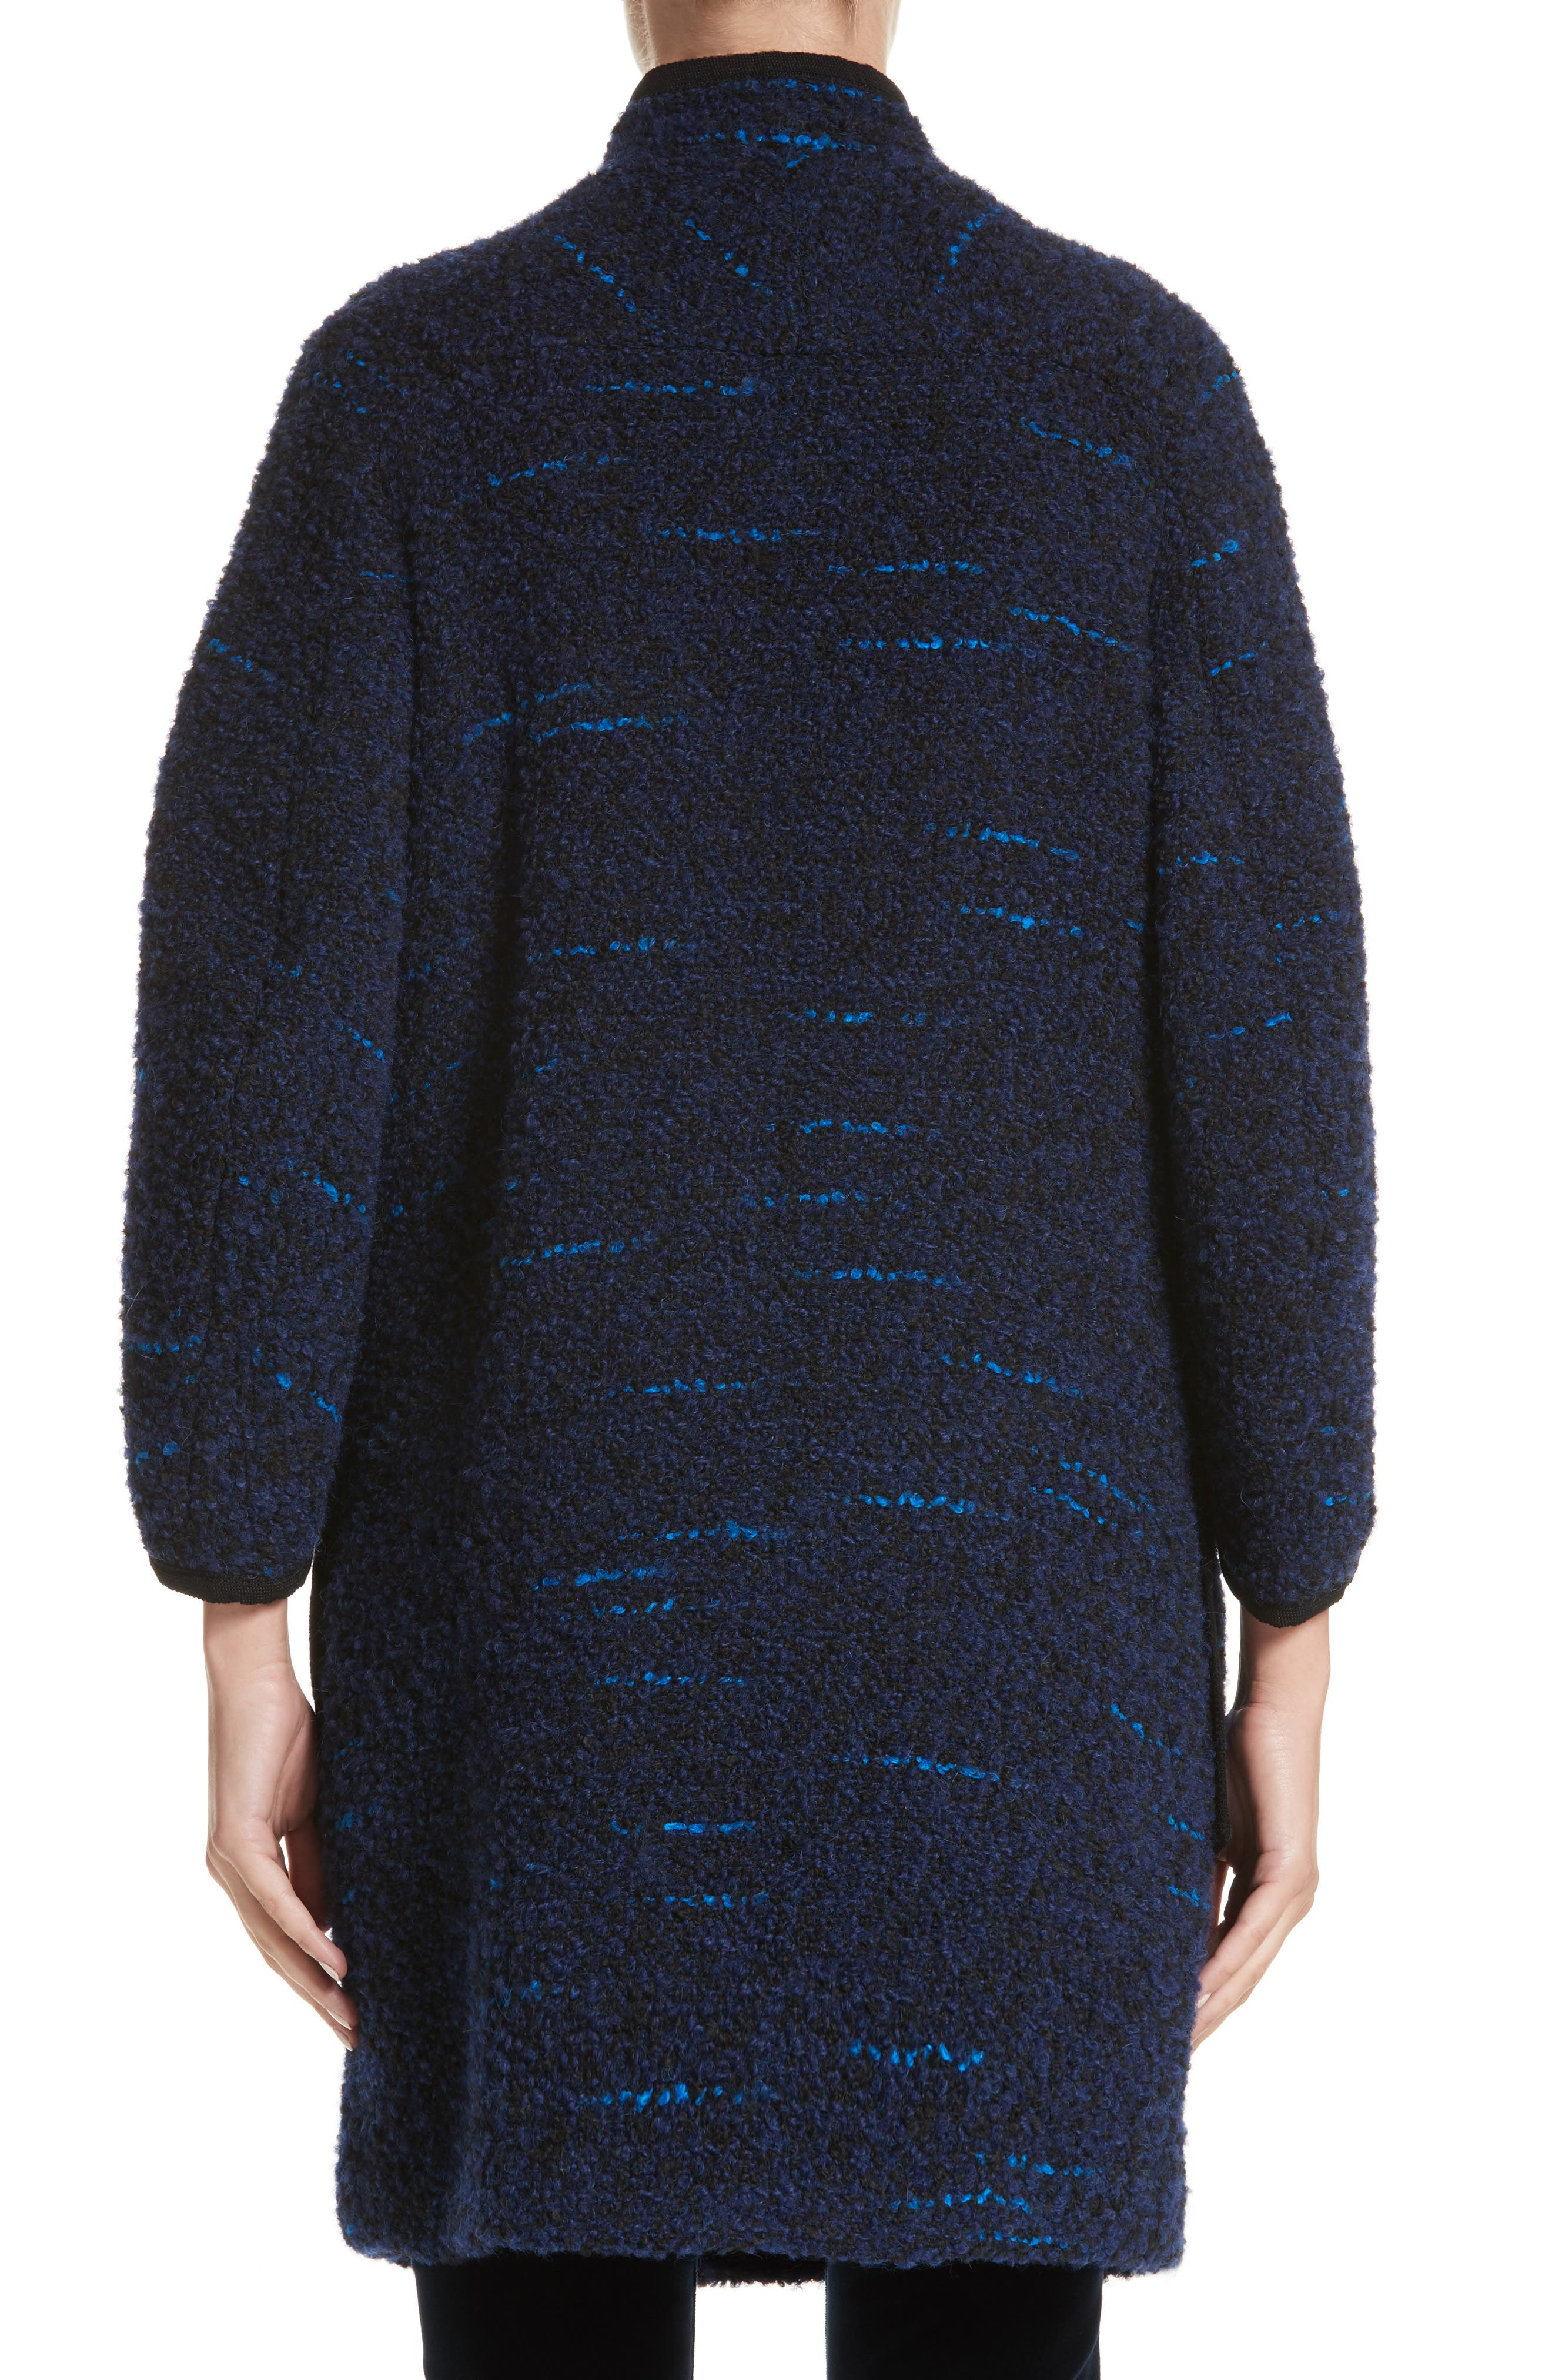 Wool Blend Swing Coat,                             Alternate thumbnail 2, color,                             Navy / Blue Multi